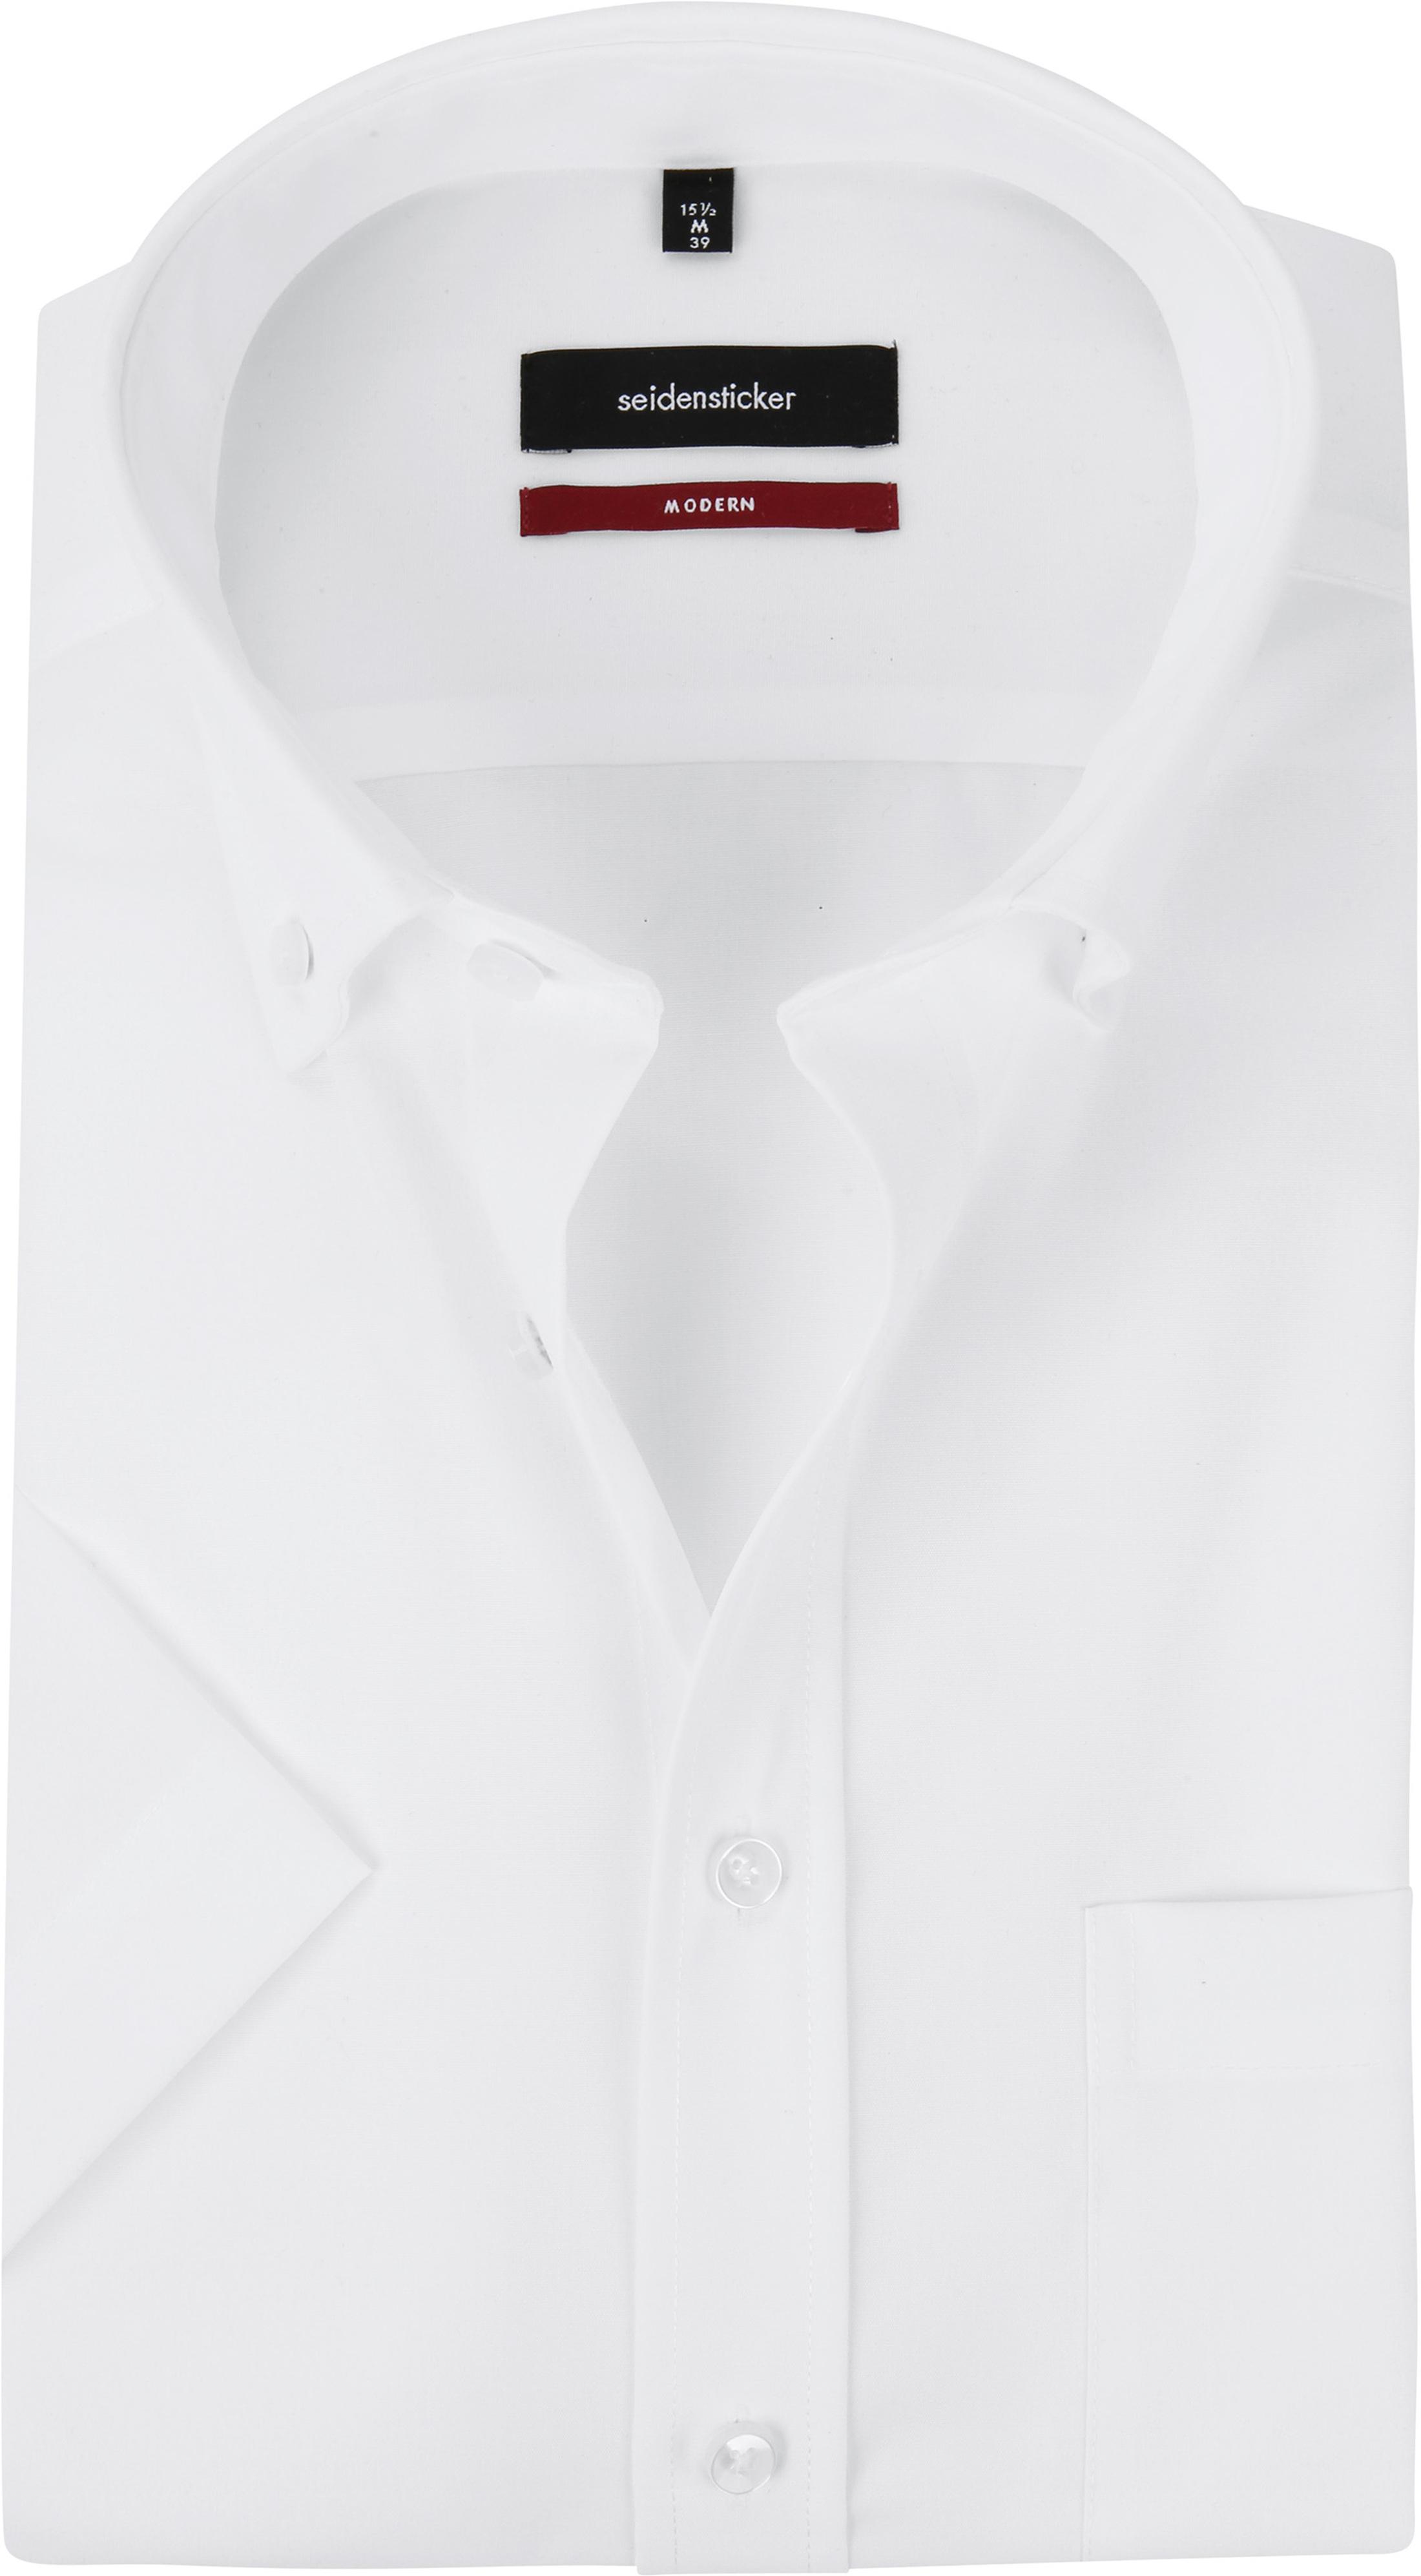 brand new ba5b0 85def Seidensticker Hemd Kurzarm Bügelfrei Modern Uni Weiß